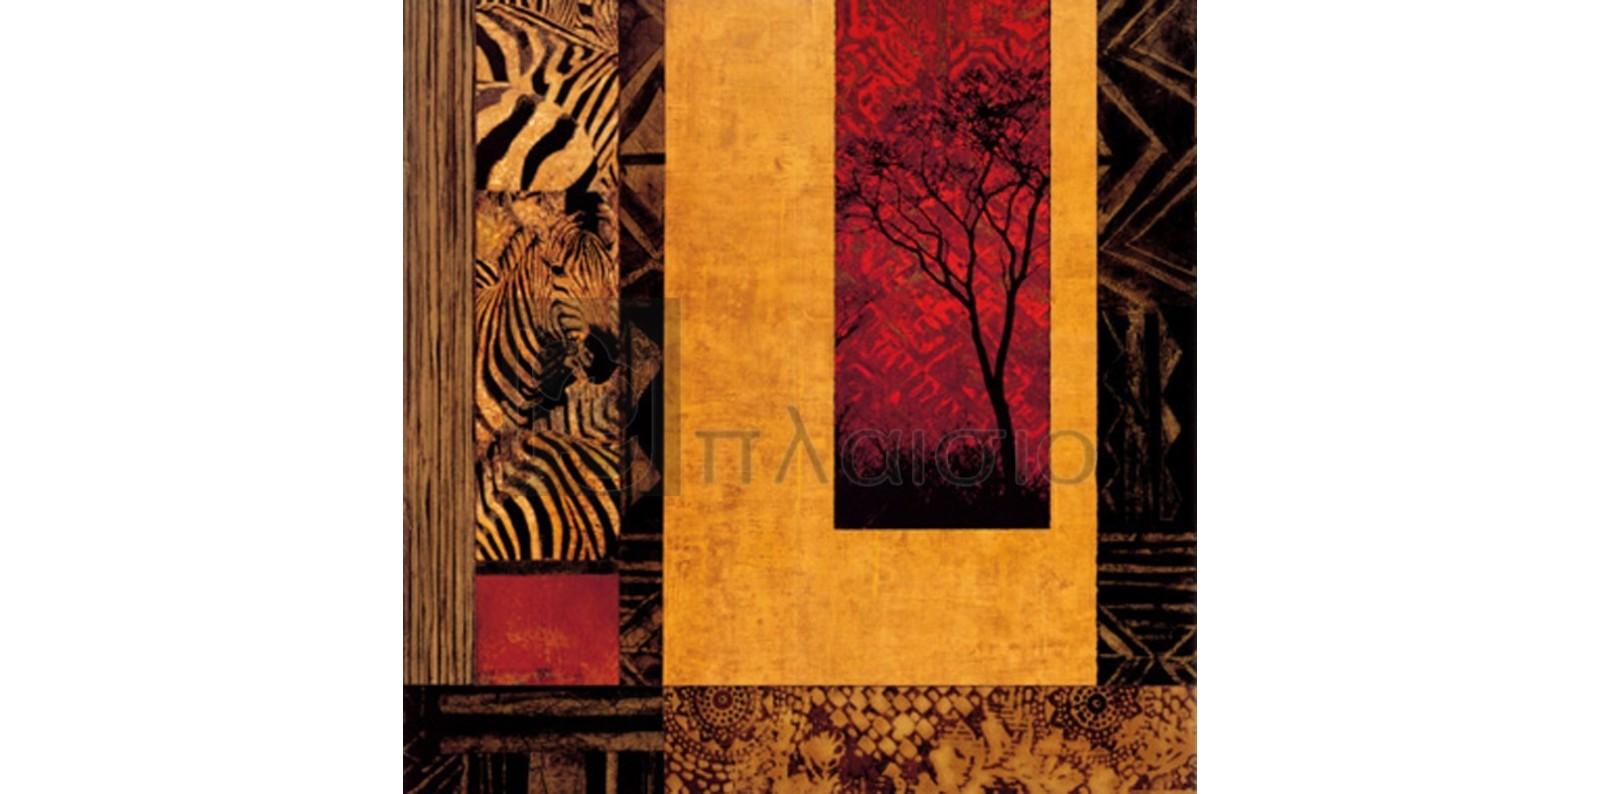 Chris Donovan - African Studies II